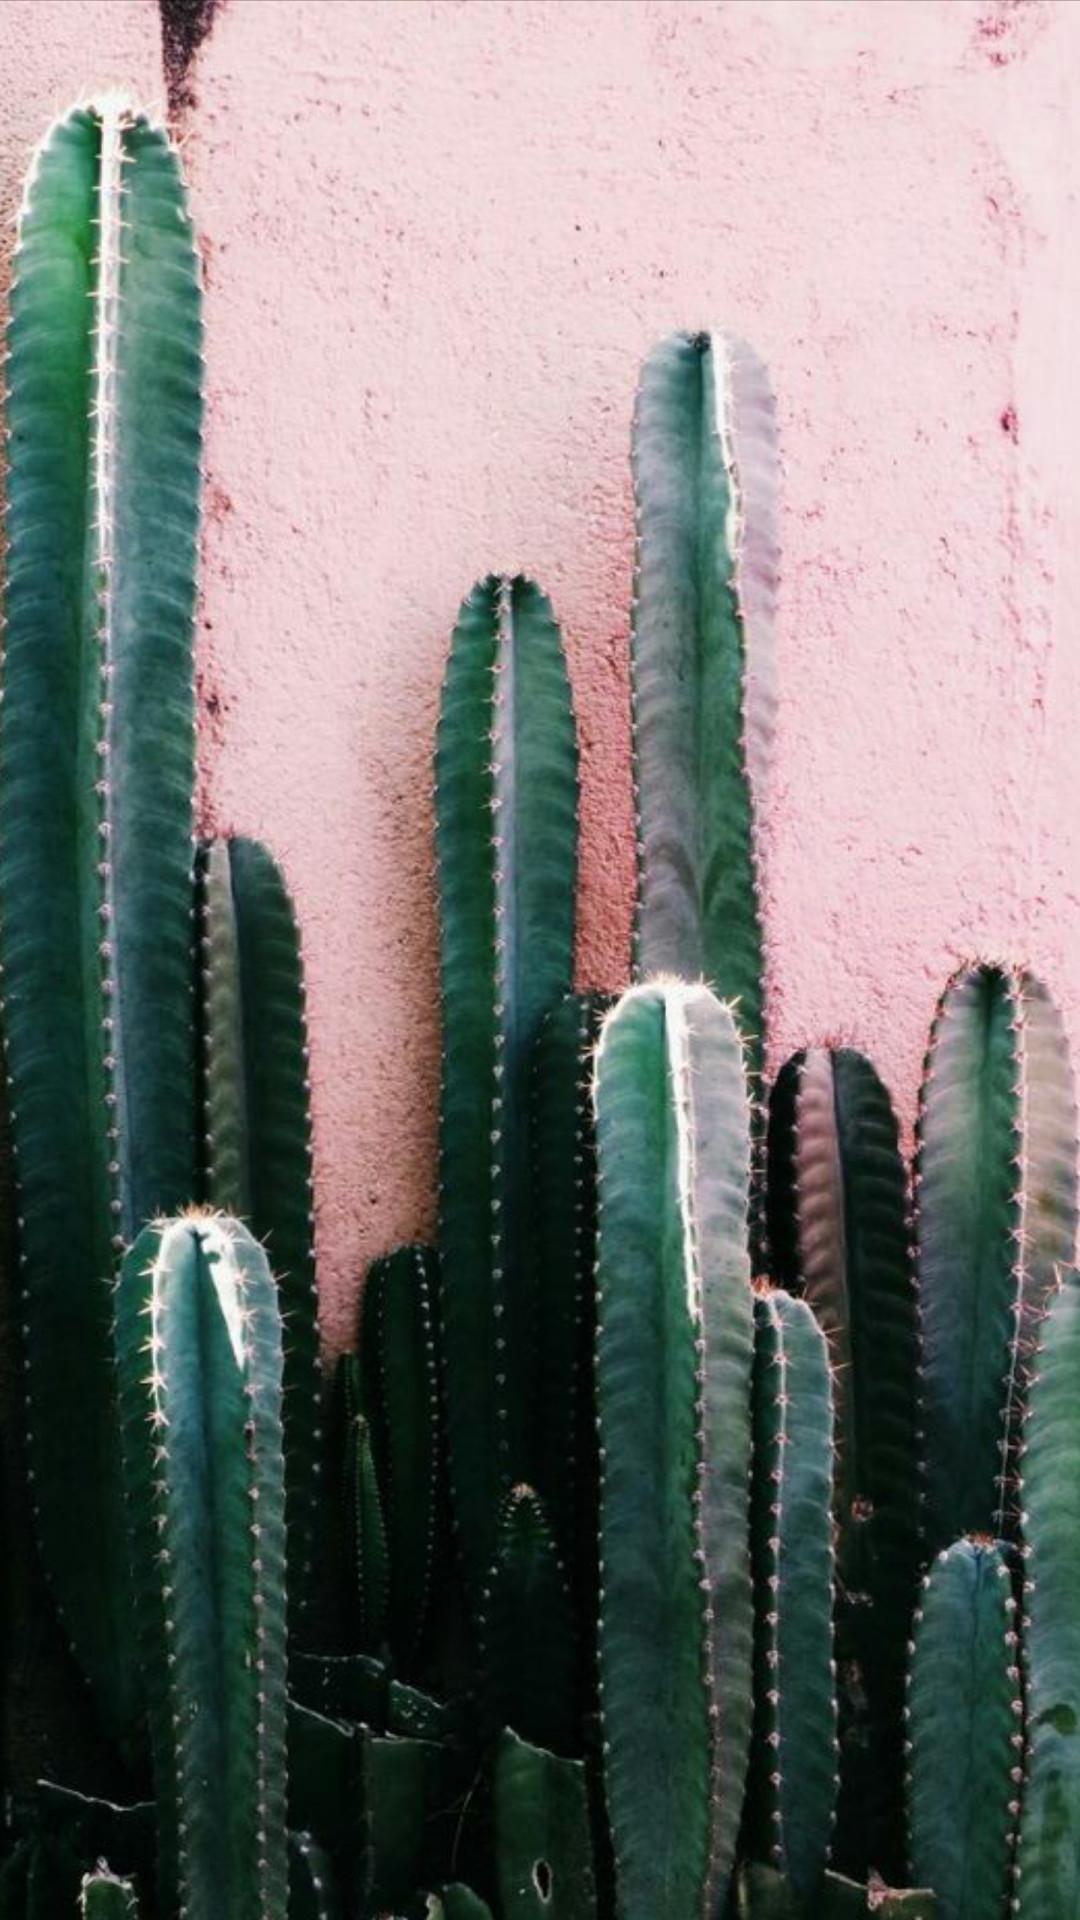 Get Desert Wallpaper Iphone Cactus JPG